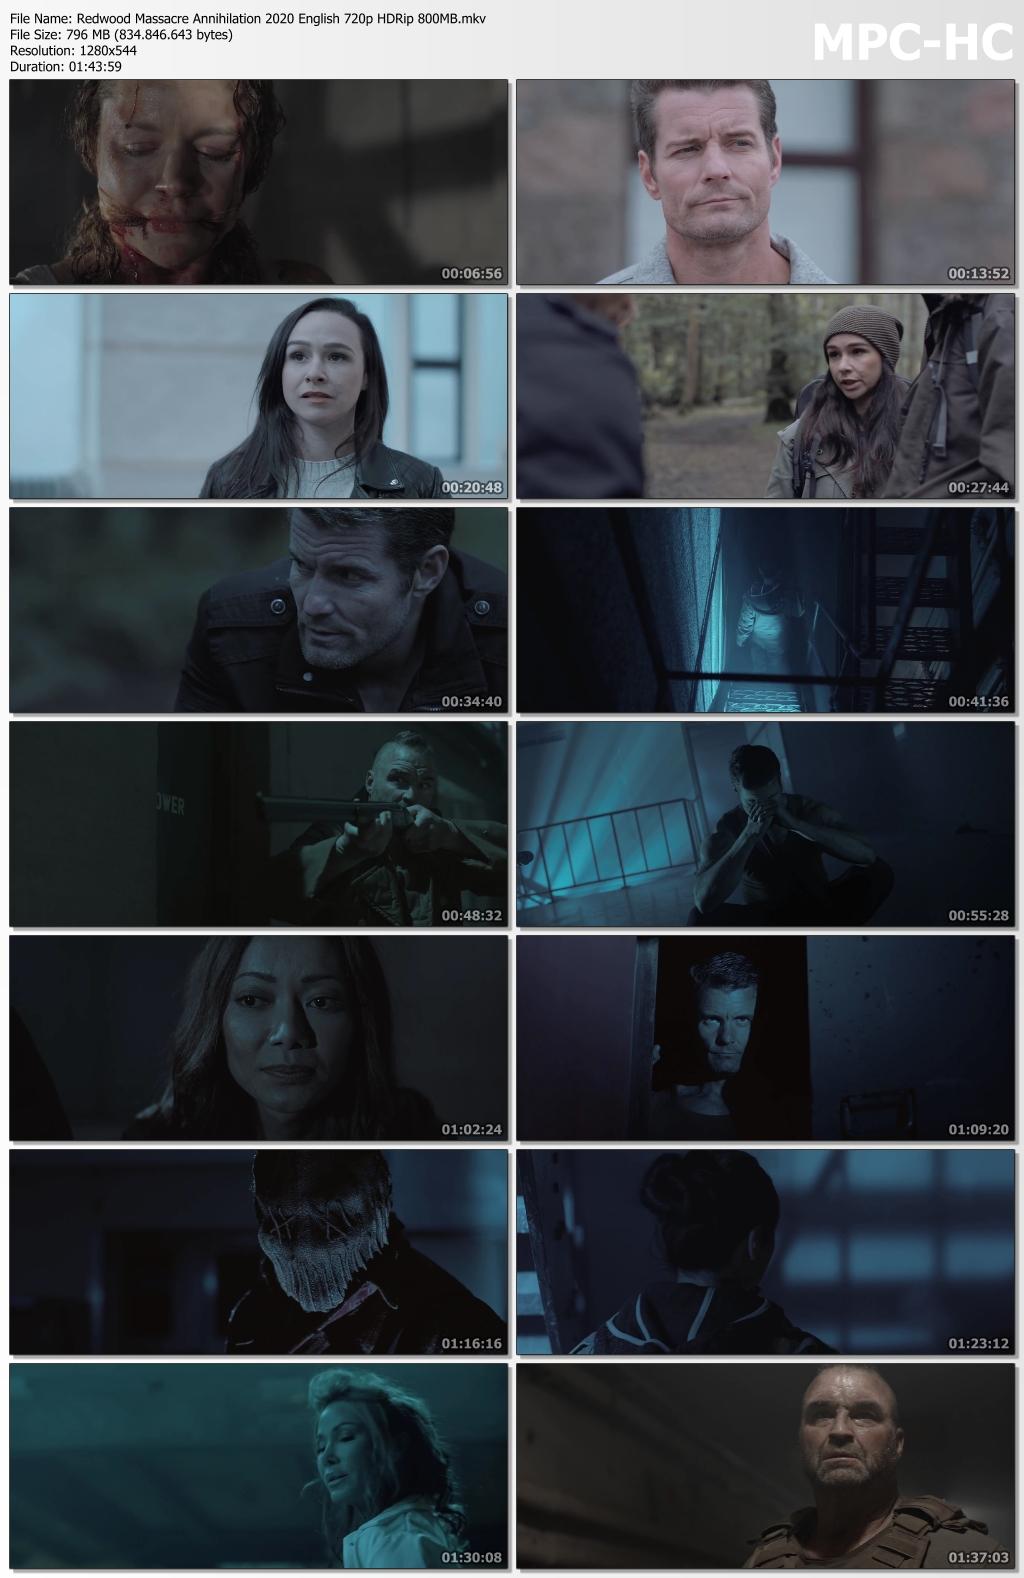 Redwood-Massacre-Annihilation-2020-English-720p-HDRip-800-MB-mkv-thumbs